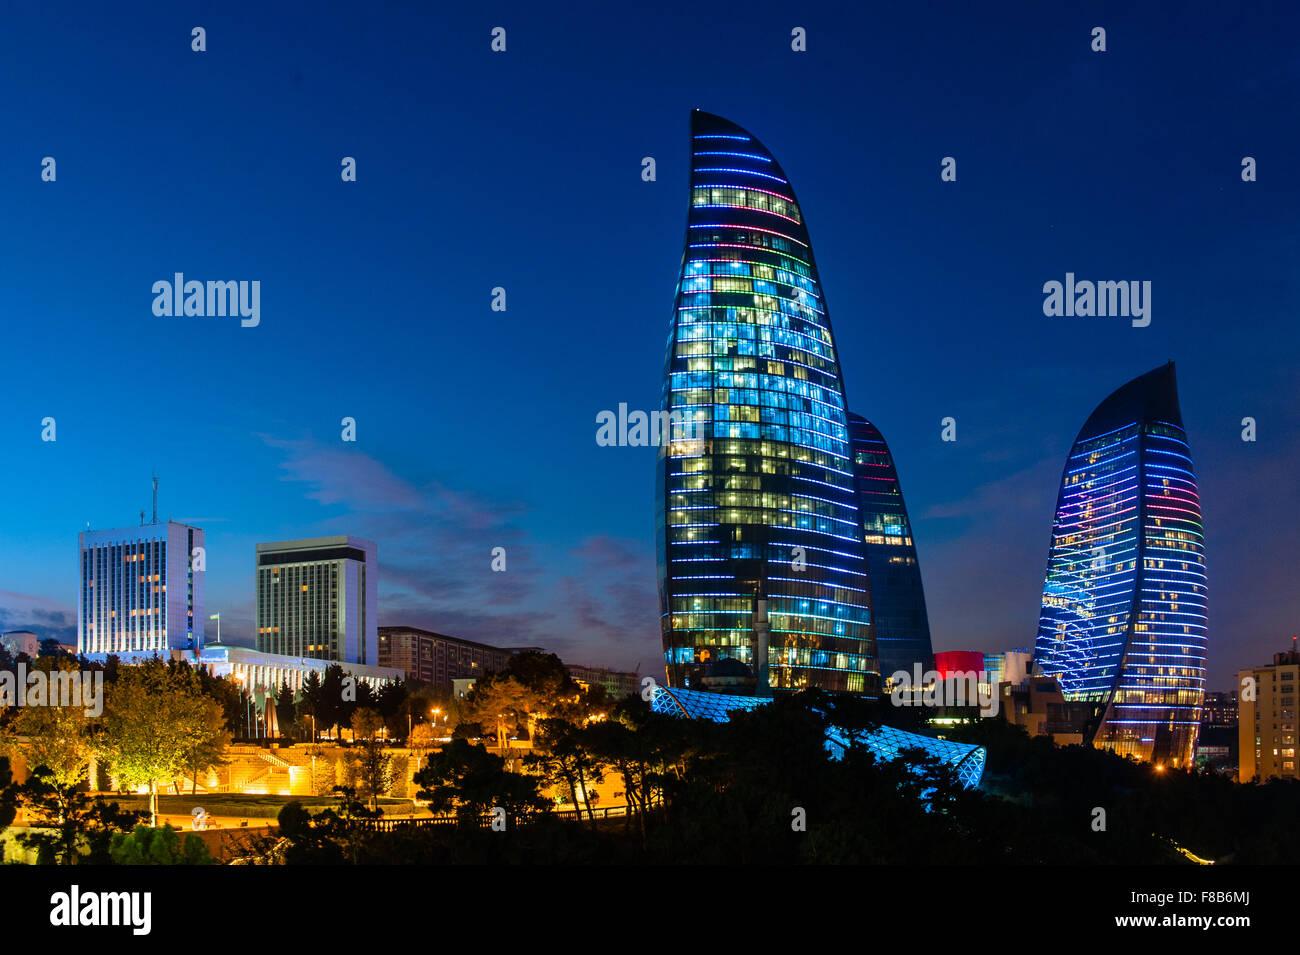 Flame Towers are new skyscrapers in Baku, Azerbaijan Stock Photo